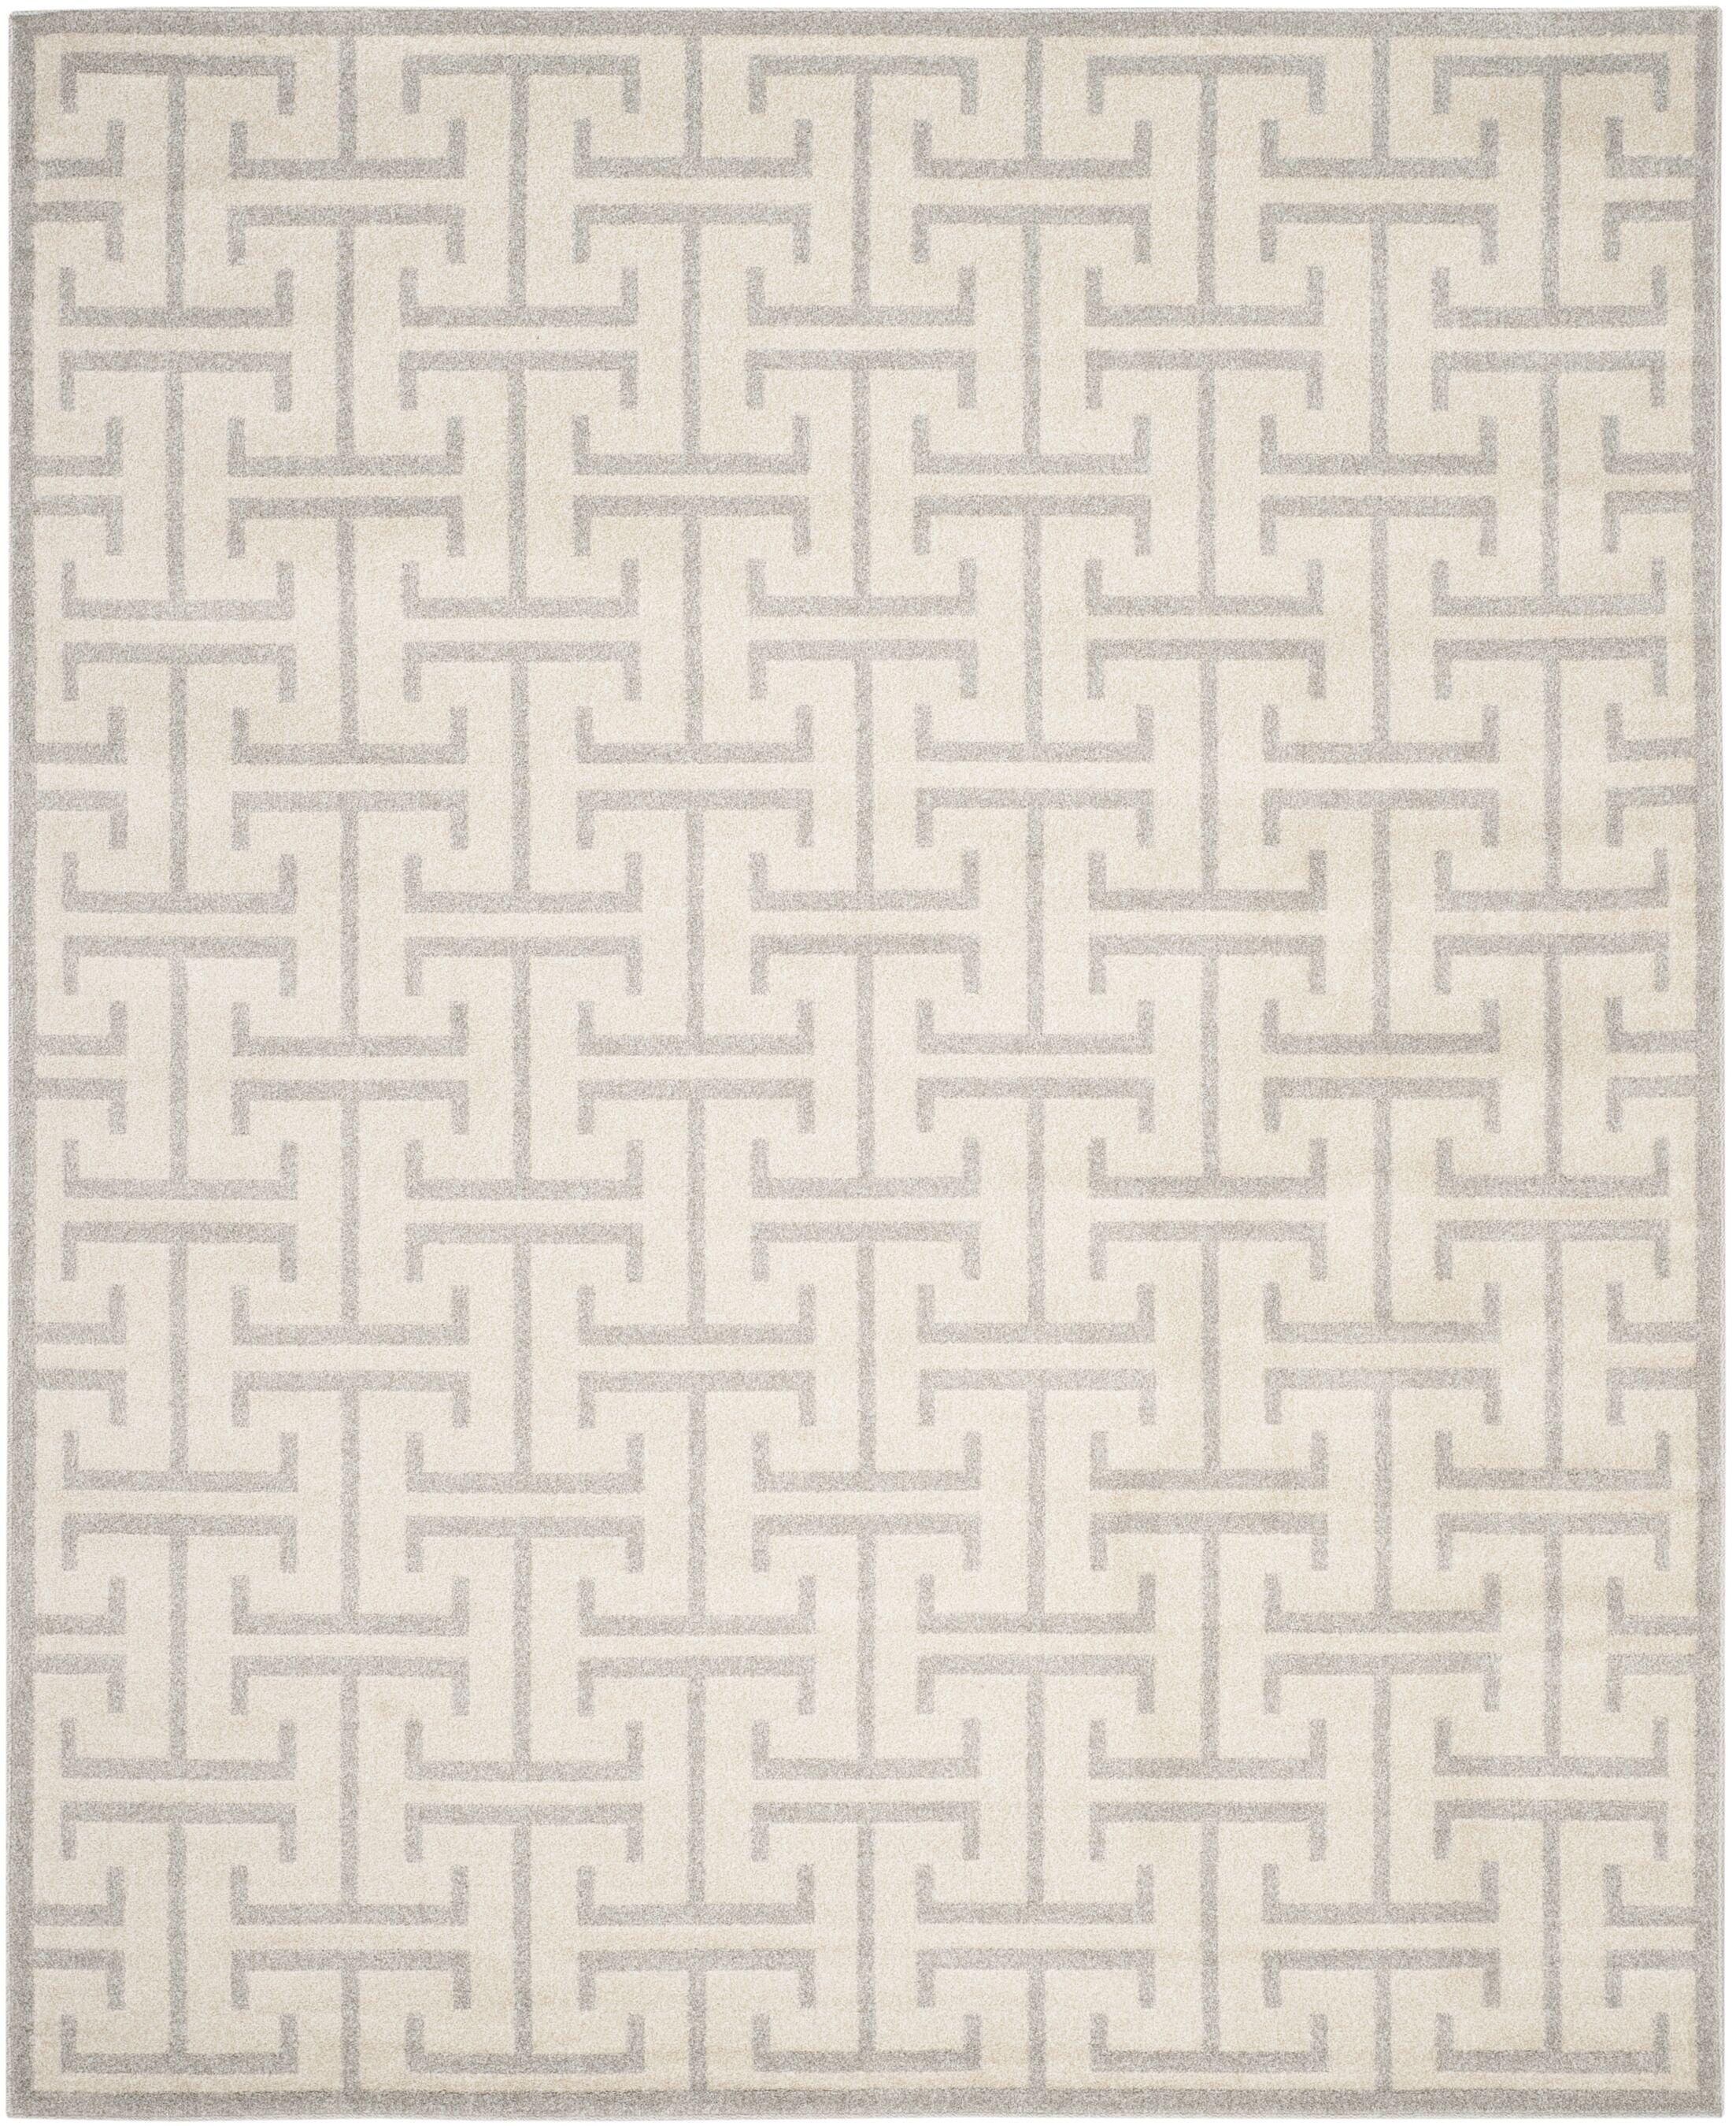 Fehi Ivory Area Rug Rug Size: Rectangle 8' x 10'